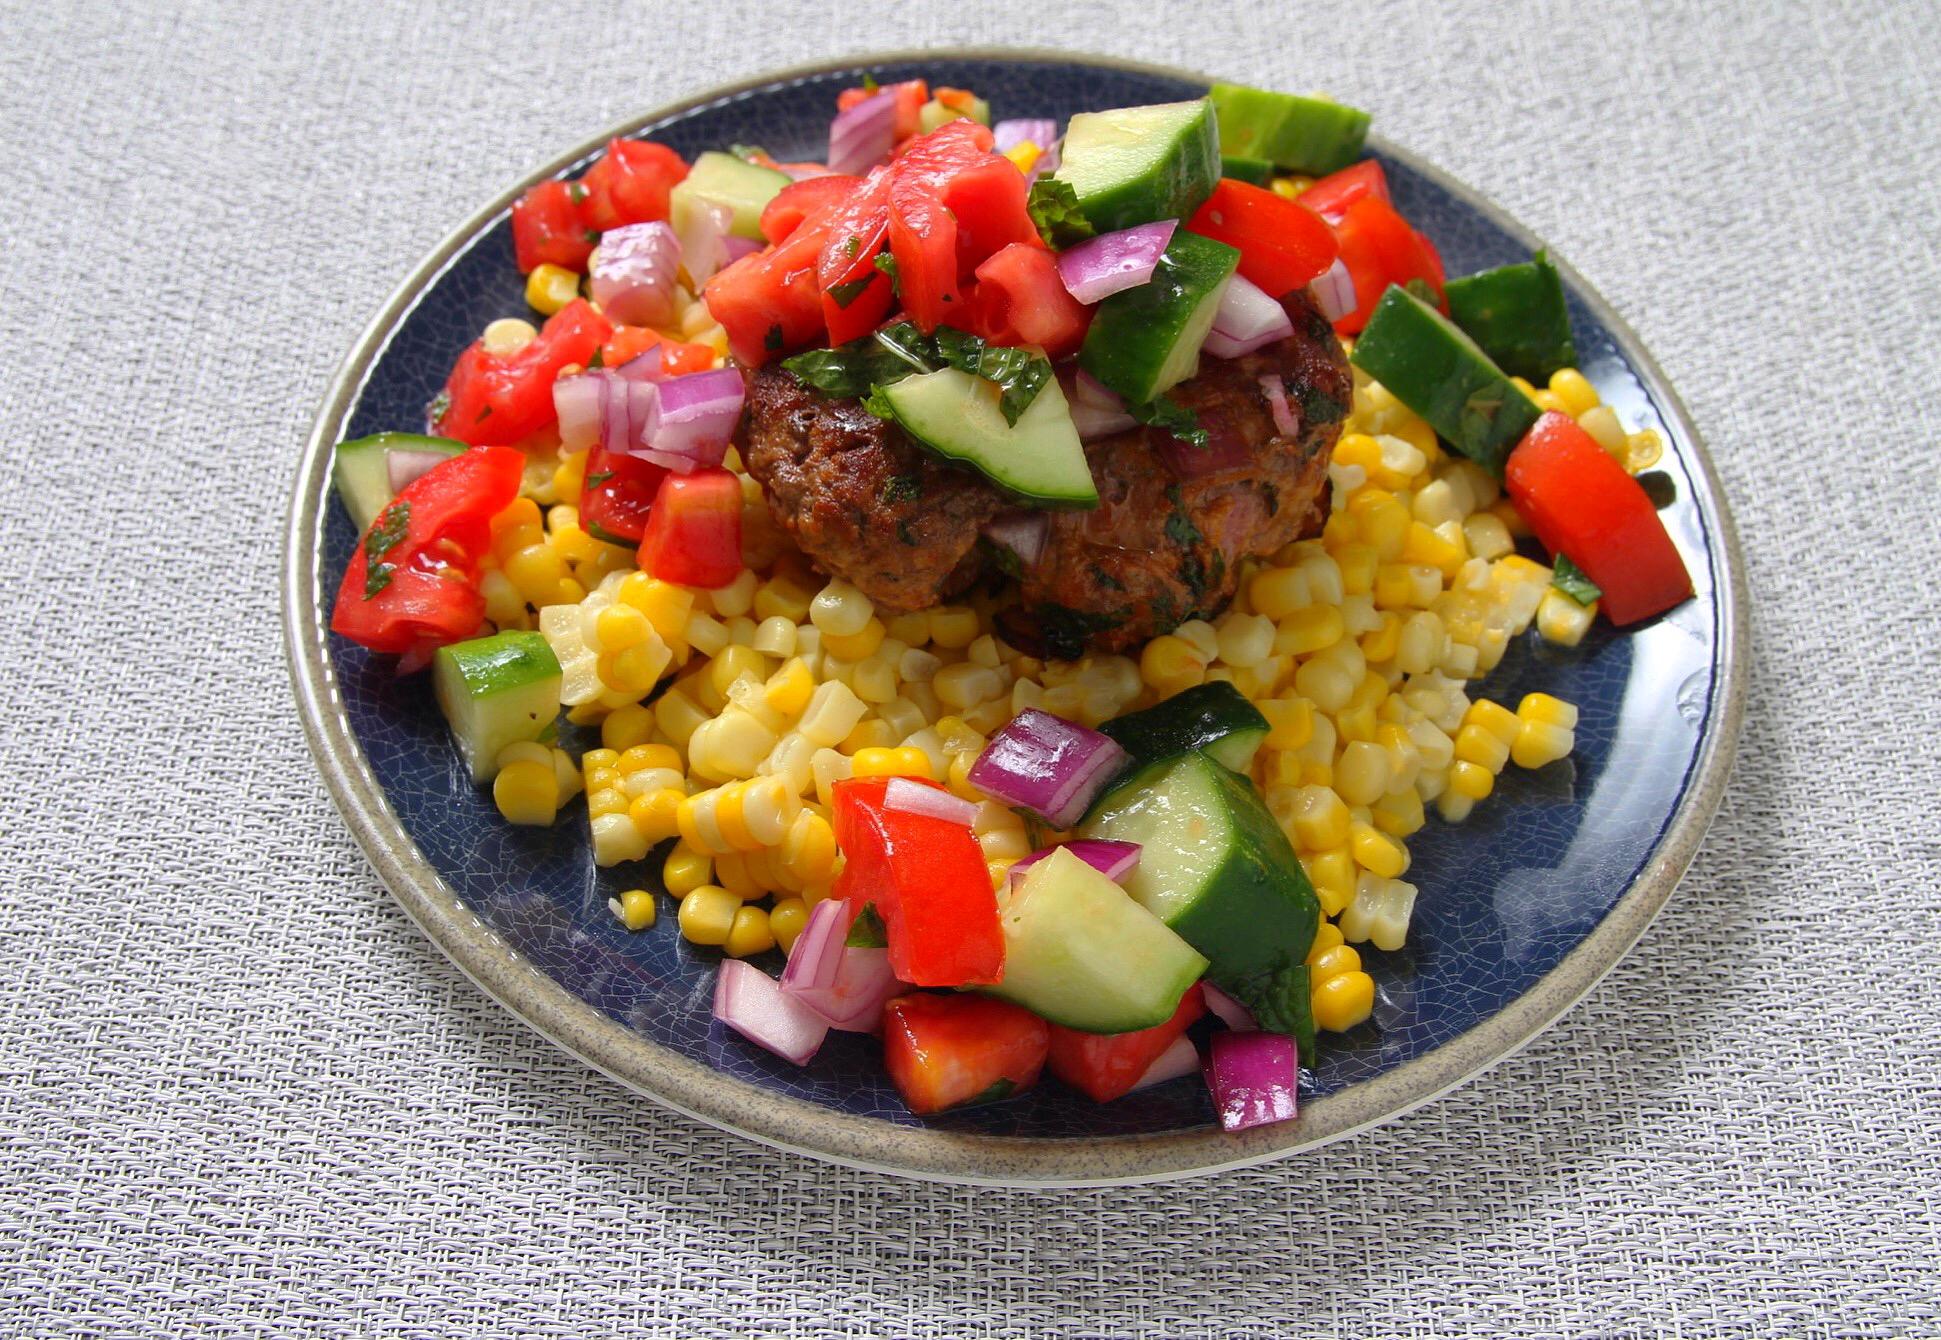 Lamb burger with Greek salad and sweet corn.